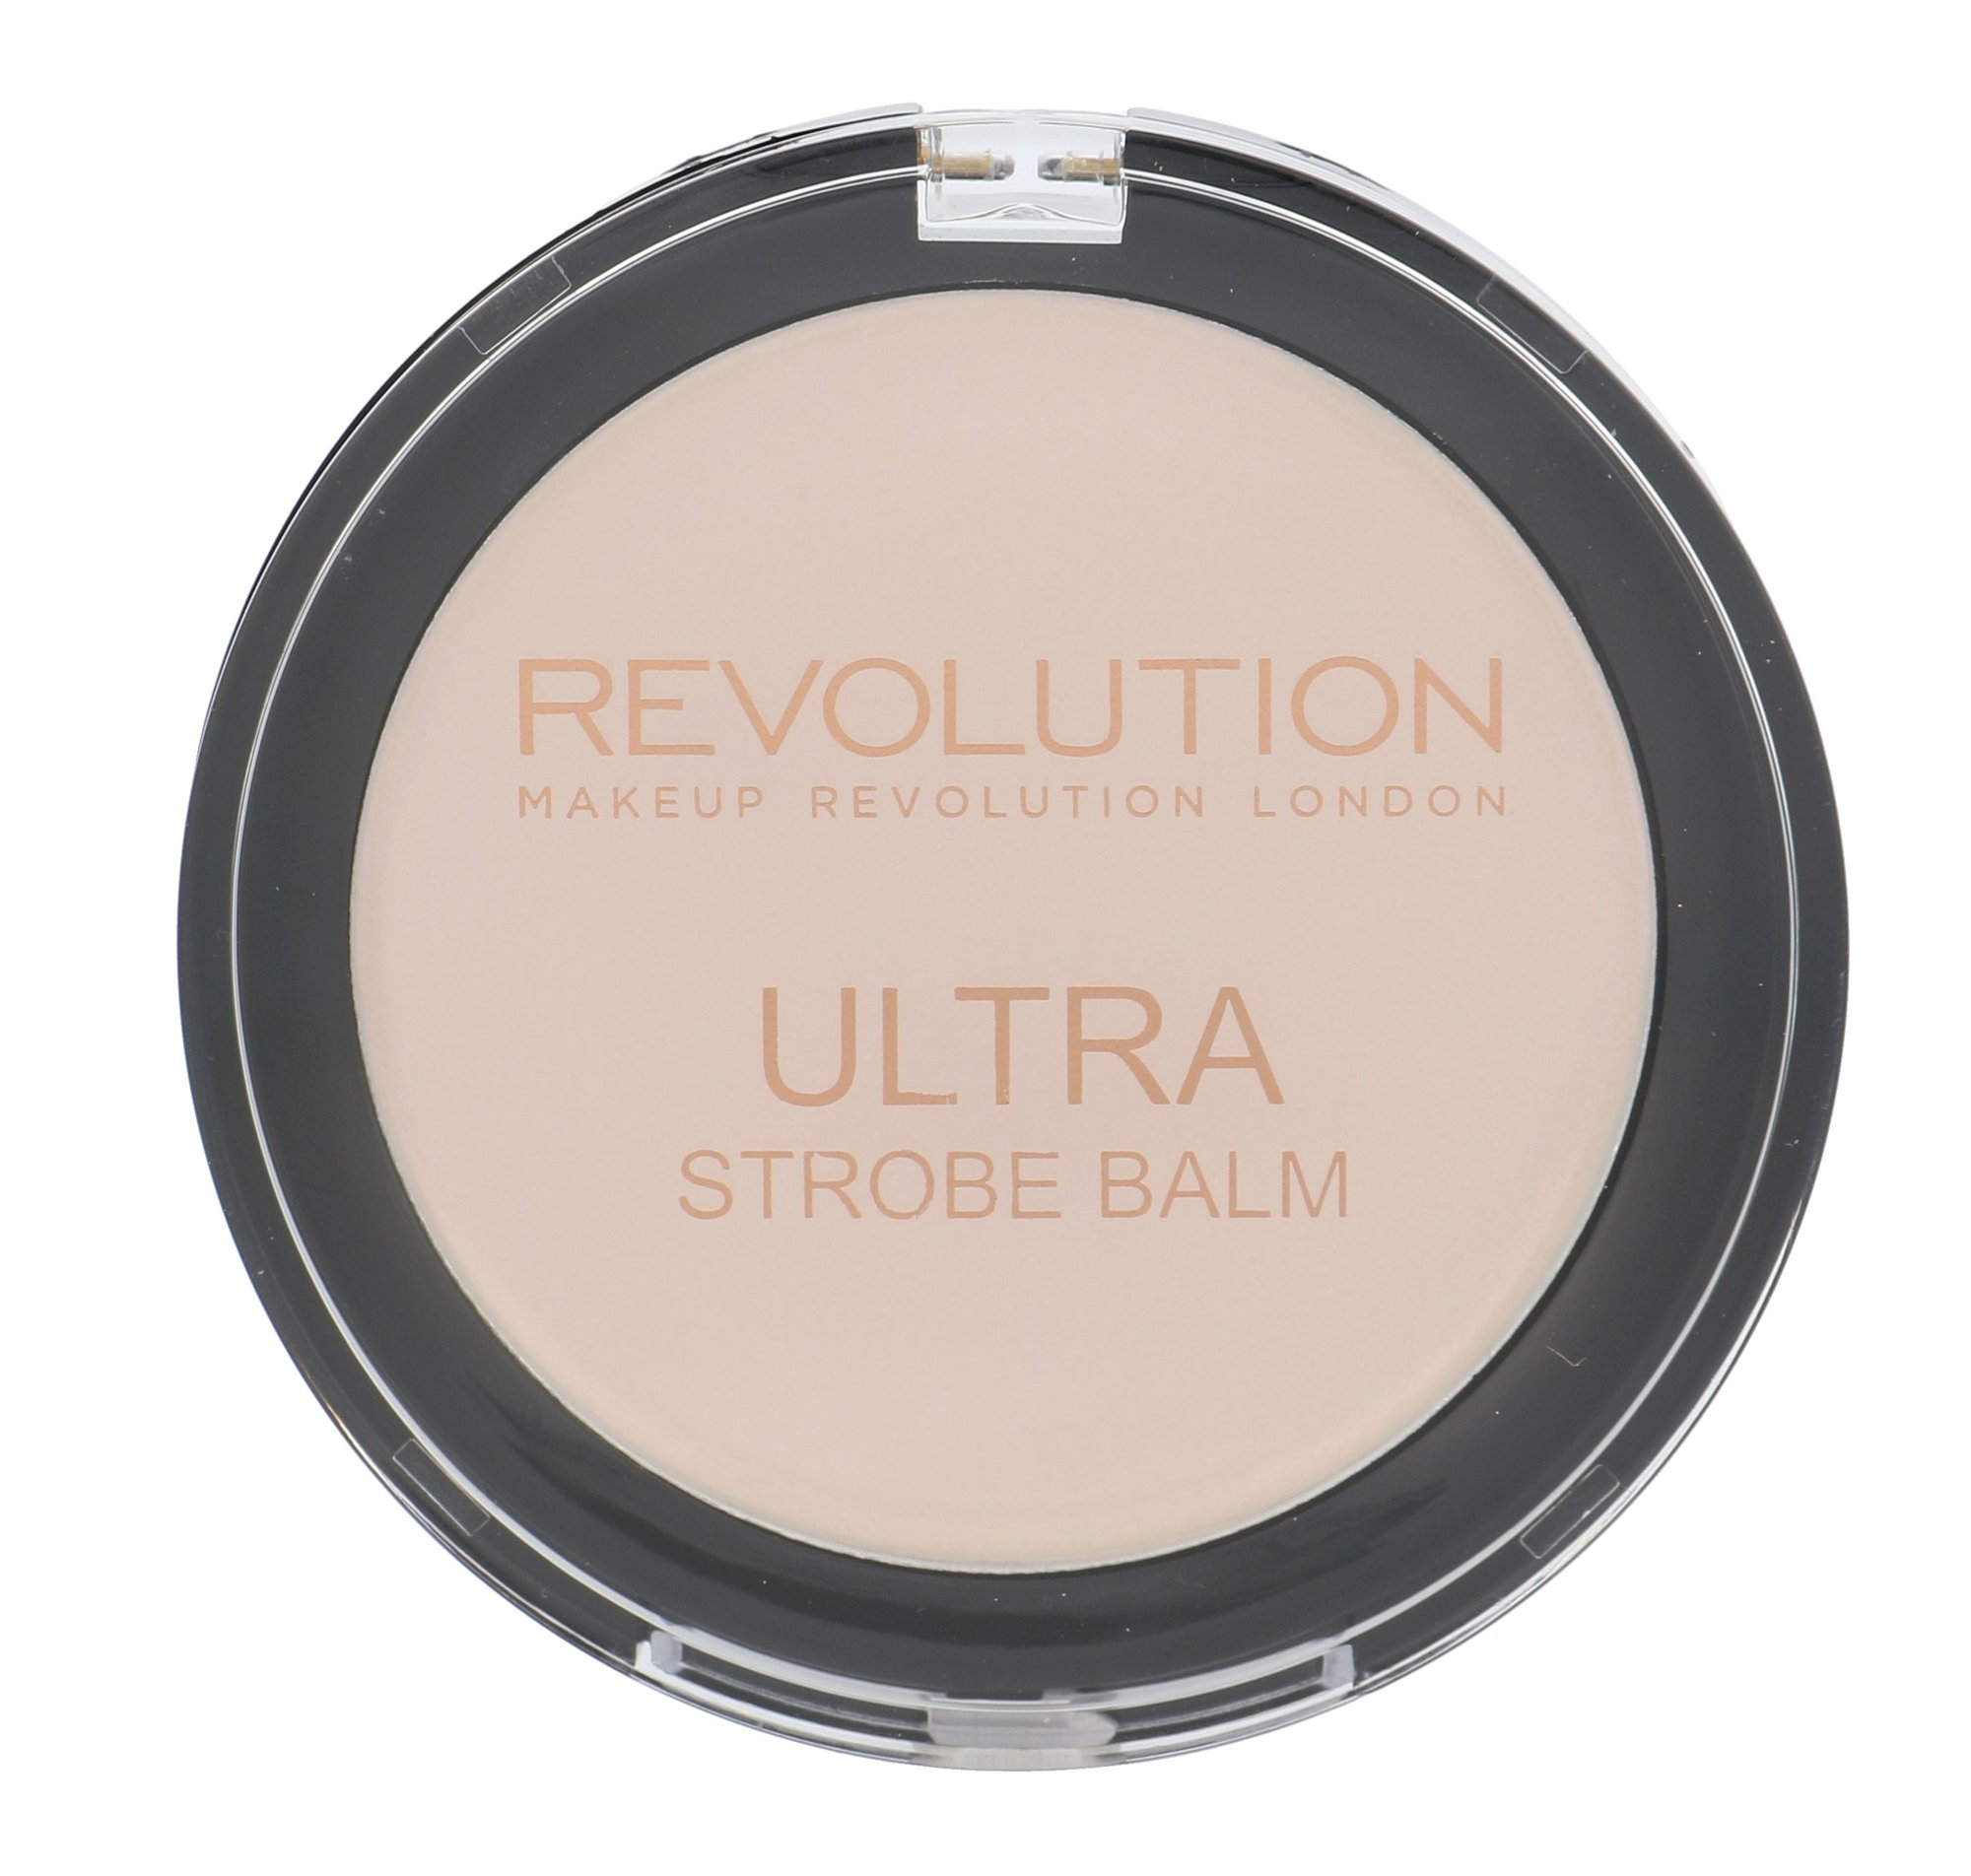 Makeup Revolution London Ultra Strobe Balm Cosmetic 6,5ml Euphoria